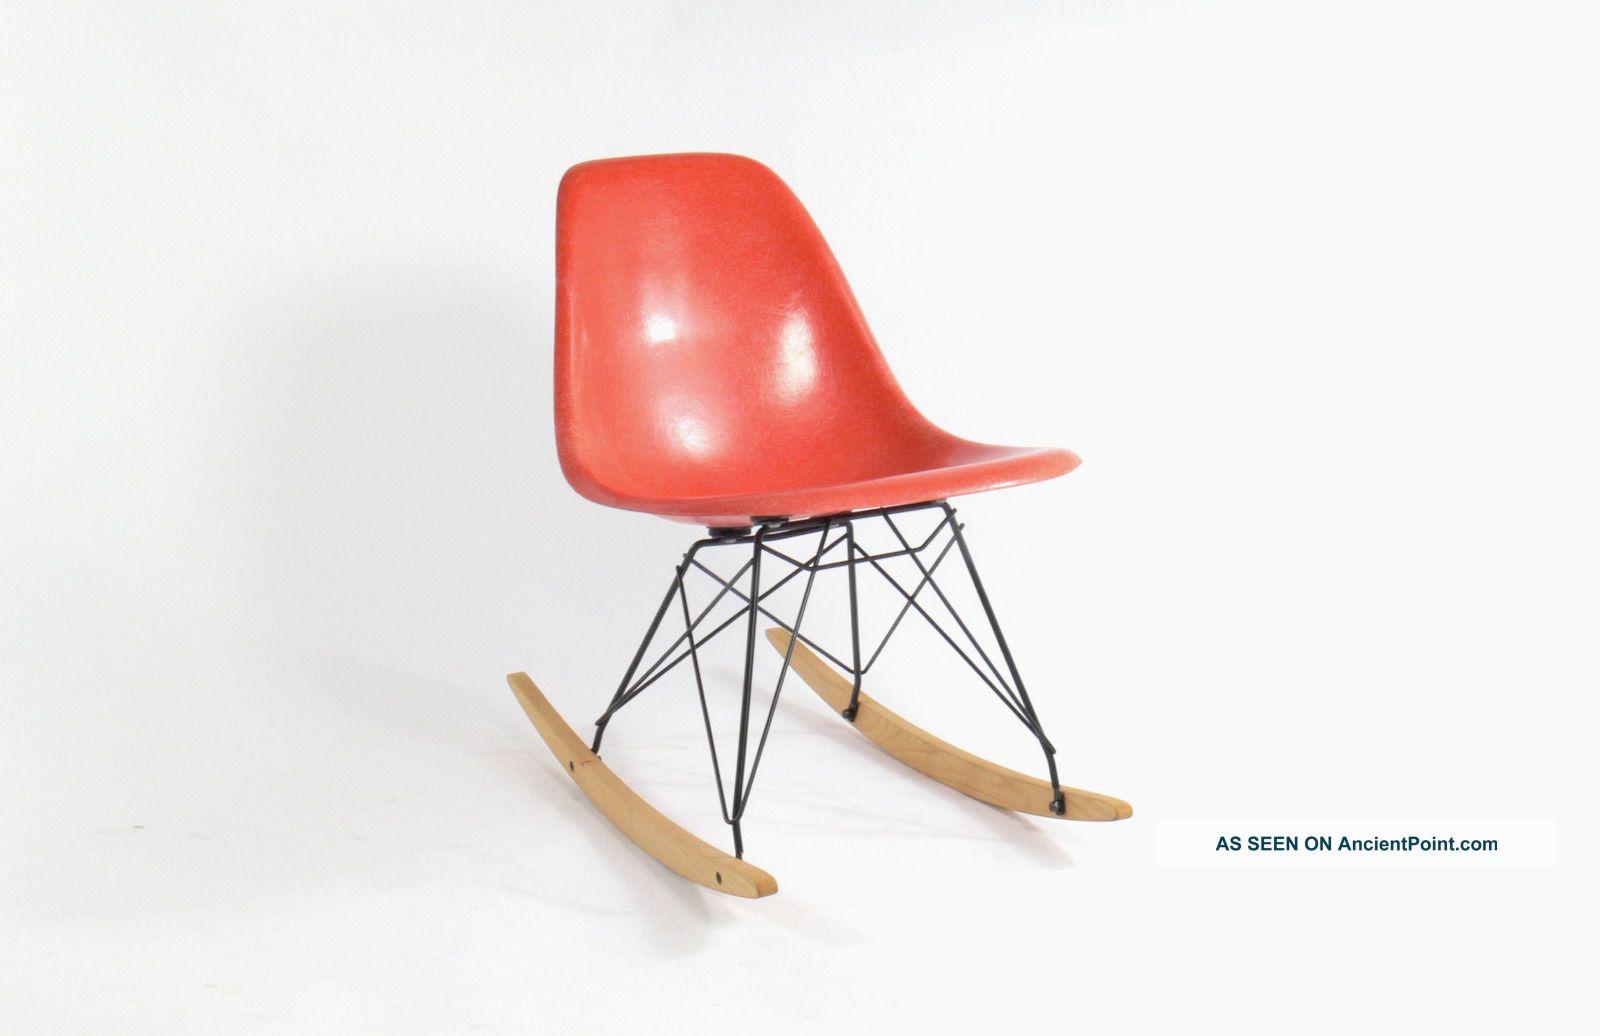 Eames For Herman Miller Fiberglass Side Chair Rocker - Rsr Mid-Century Modernism photo